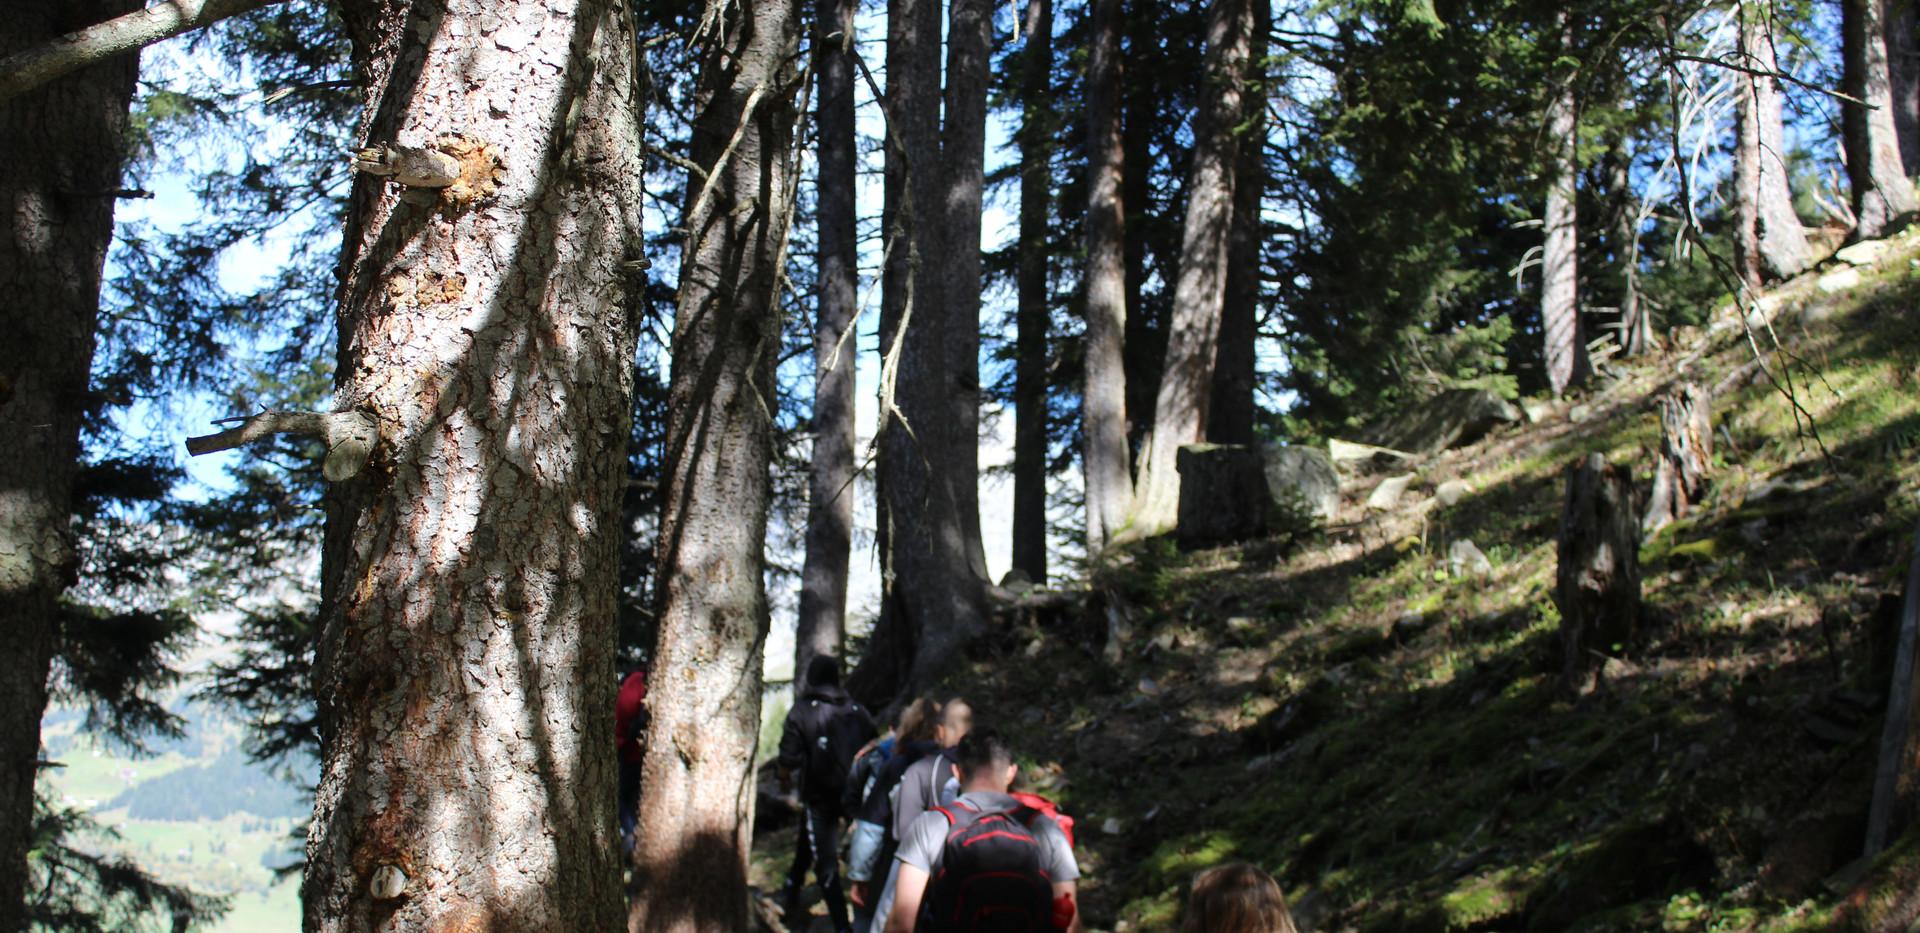 Wanderung Wald.JPG